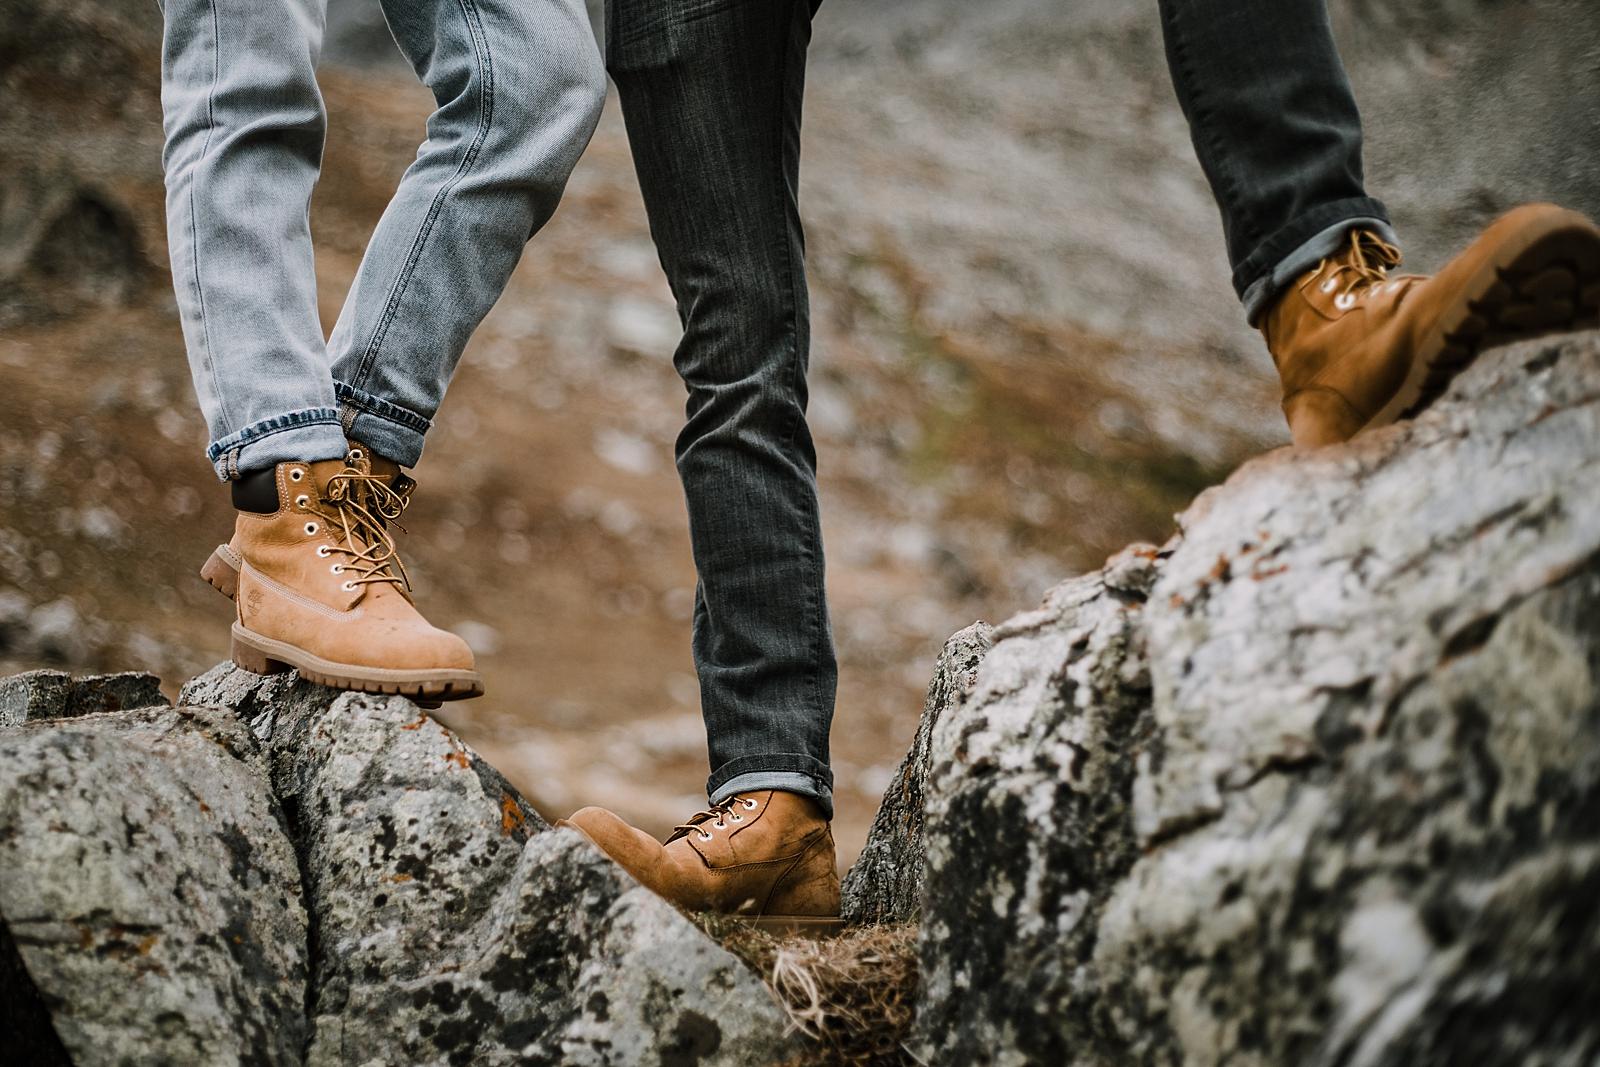 timberland boots, colorado surprise proposal, hike mayflower gulch, mayflower gulch proposal, mayflower gulch elopement, mayflower gulch wedding, colorado mountainscape, leadville elopement